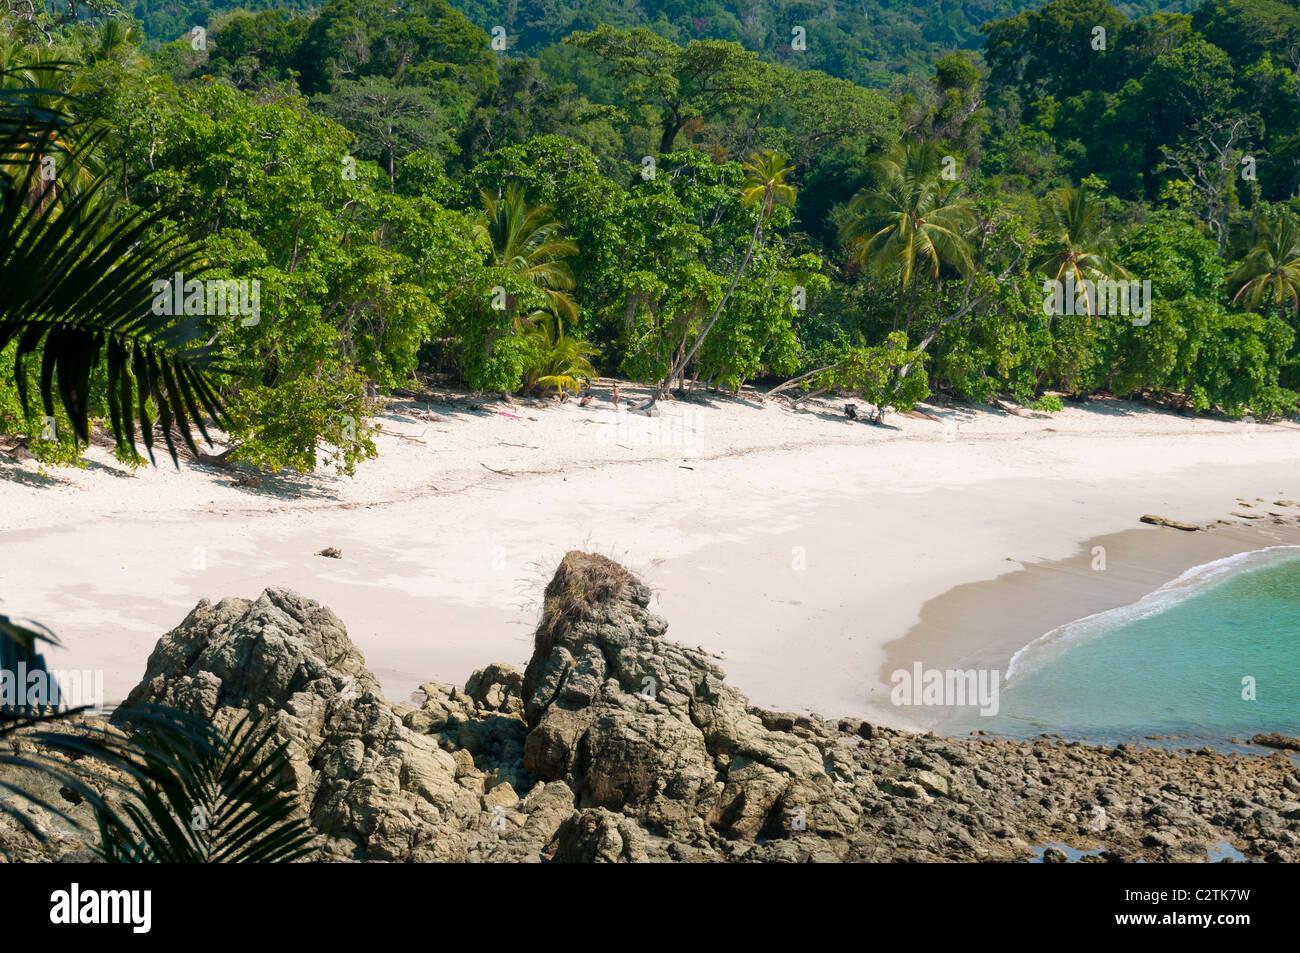 Pristine beach at Manuel Antonio National Park, Puntarenas Province, Costa Rica - Stock Image